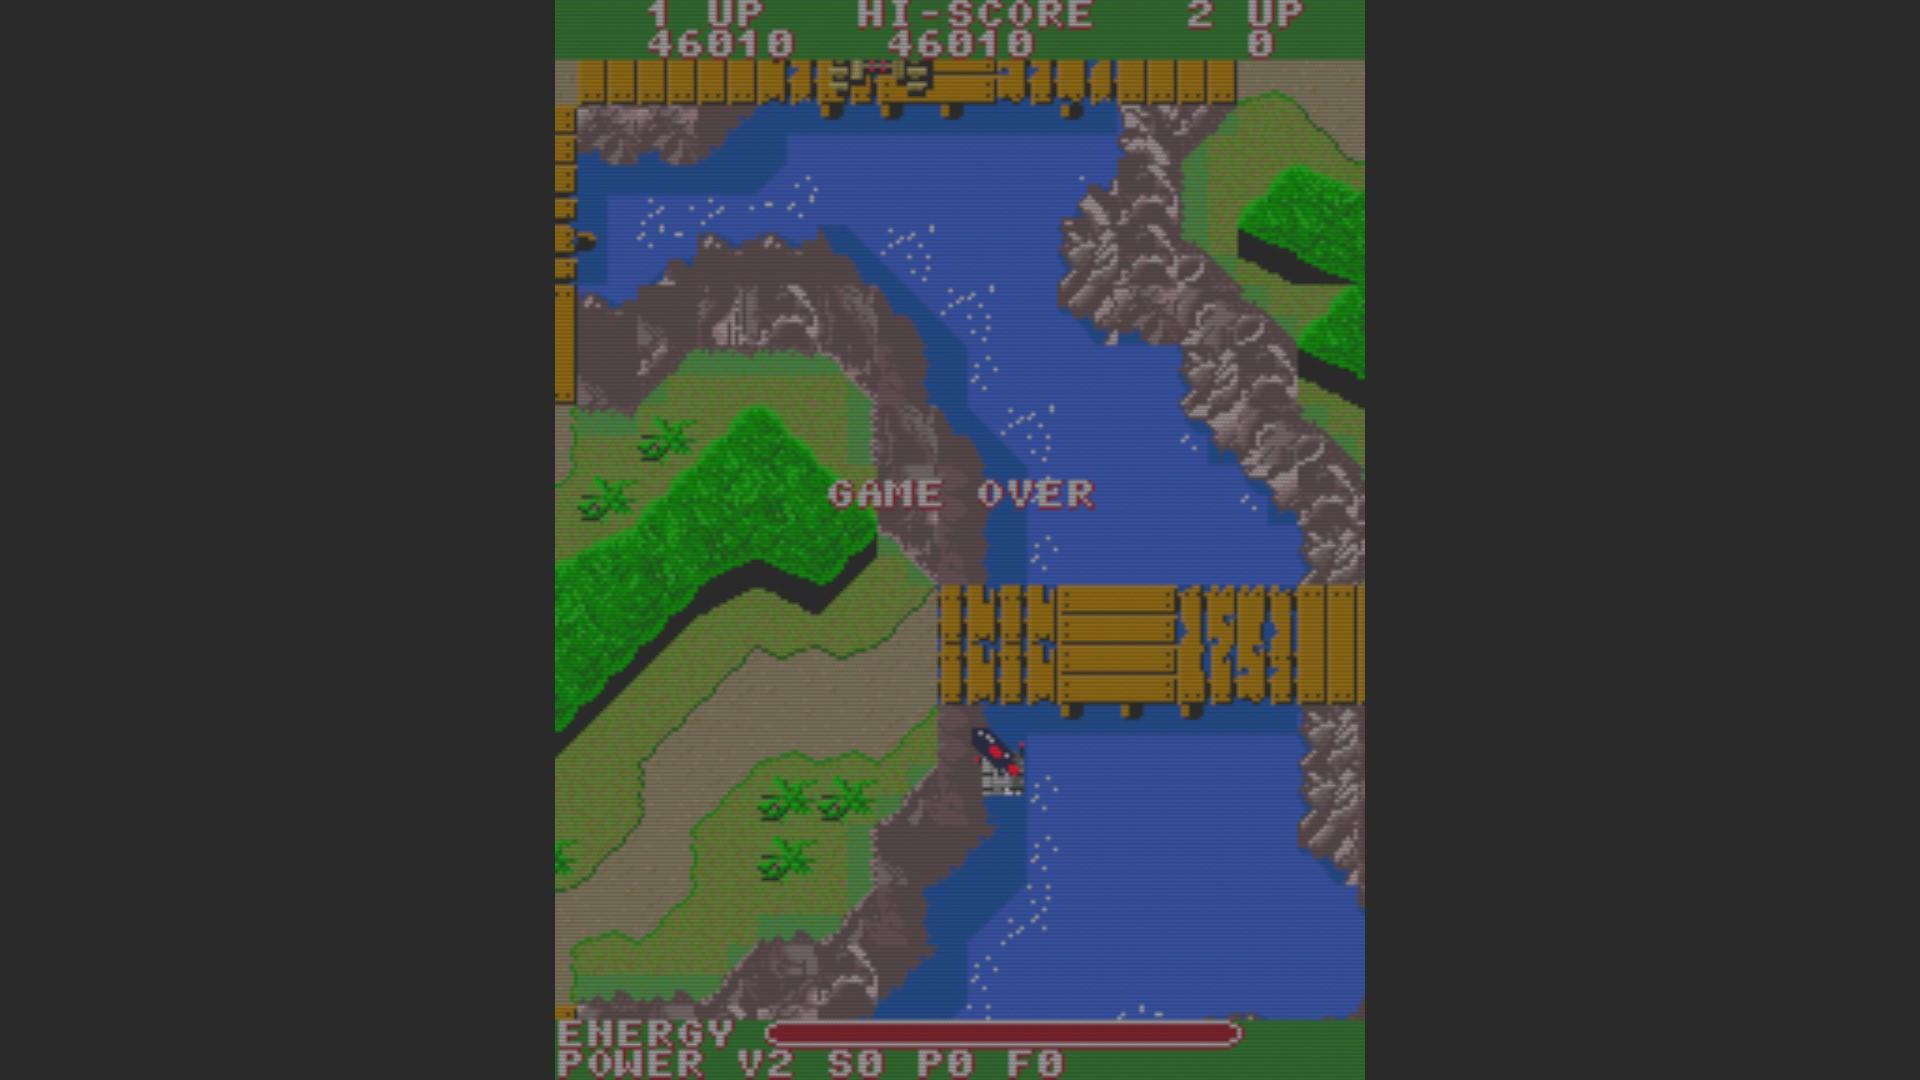 AkinNahtanoj: SNK 40th Anniversary Collection: TNK III [Arcade] (PC) 46,010 points on 2020-08-24 15:52:46